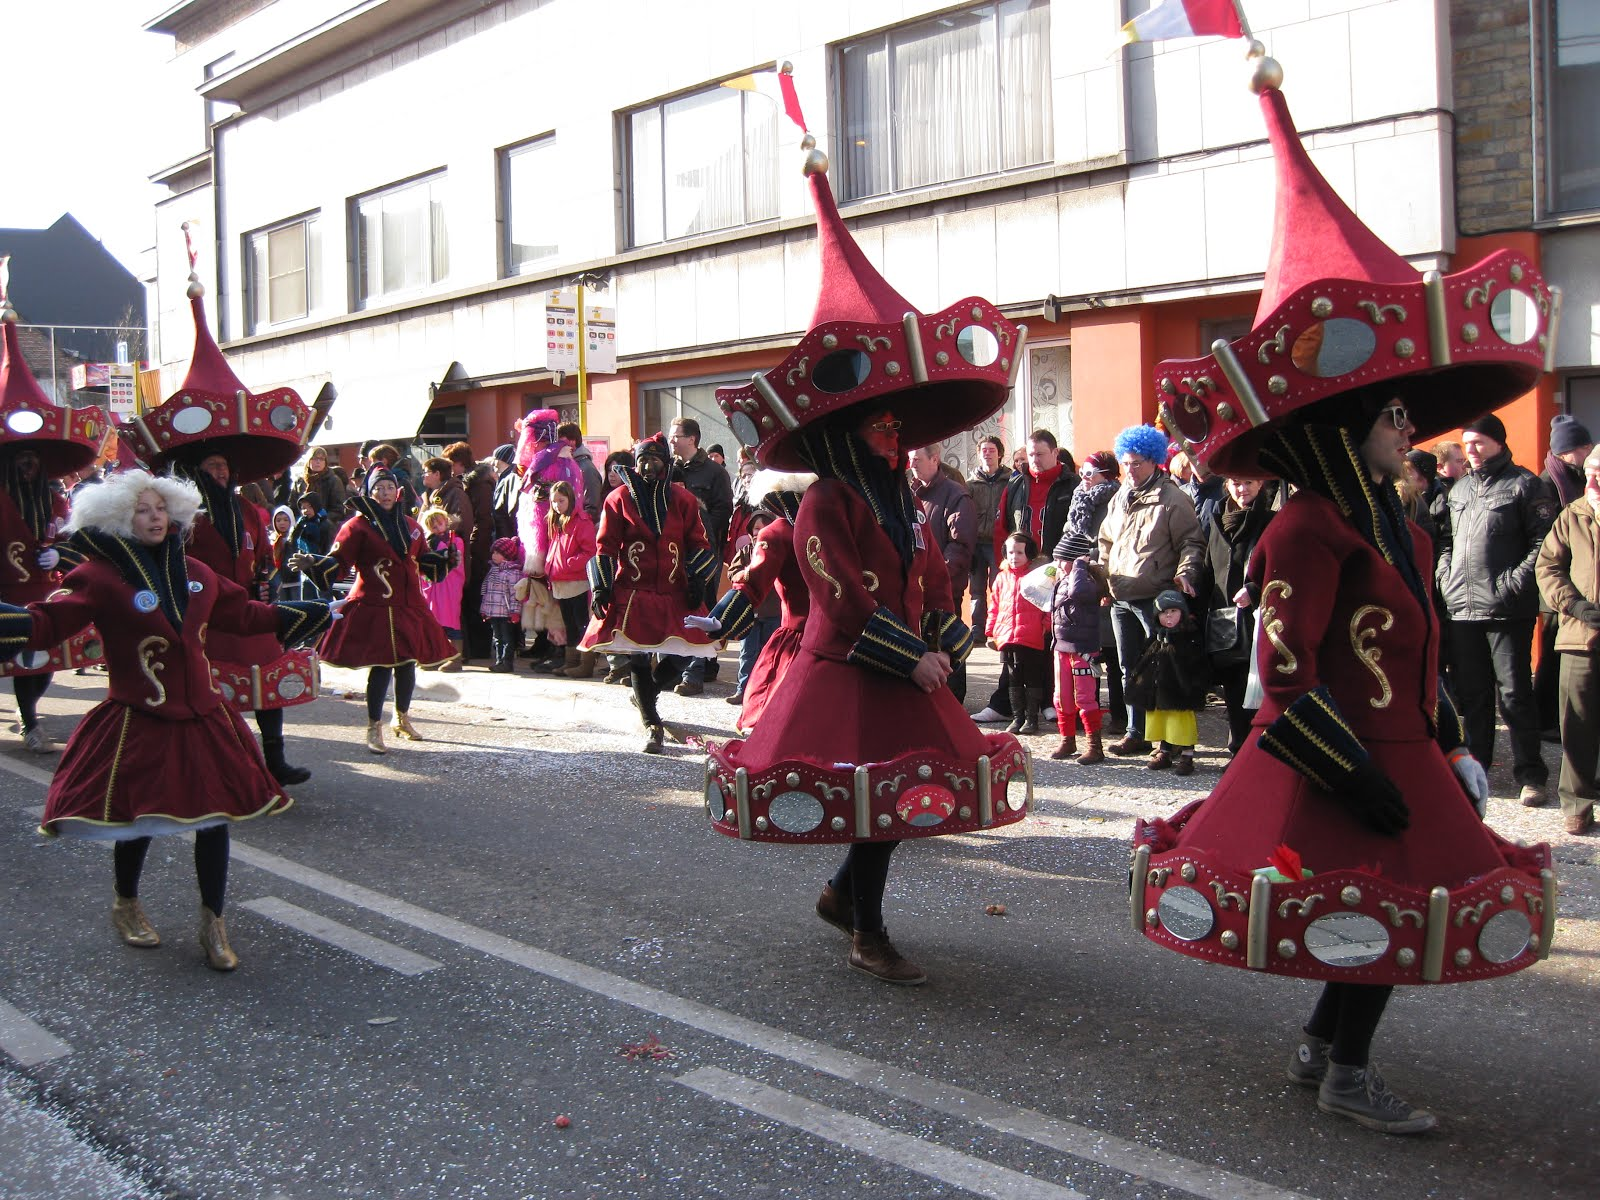 Carnaval Aalst foto- en videoblog: 7. Eirg